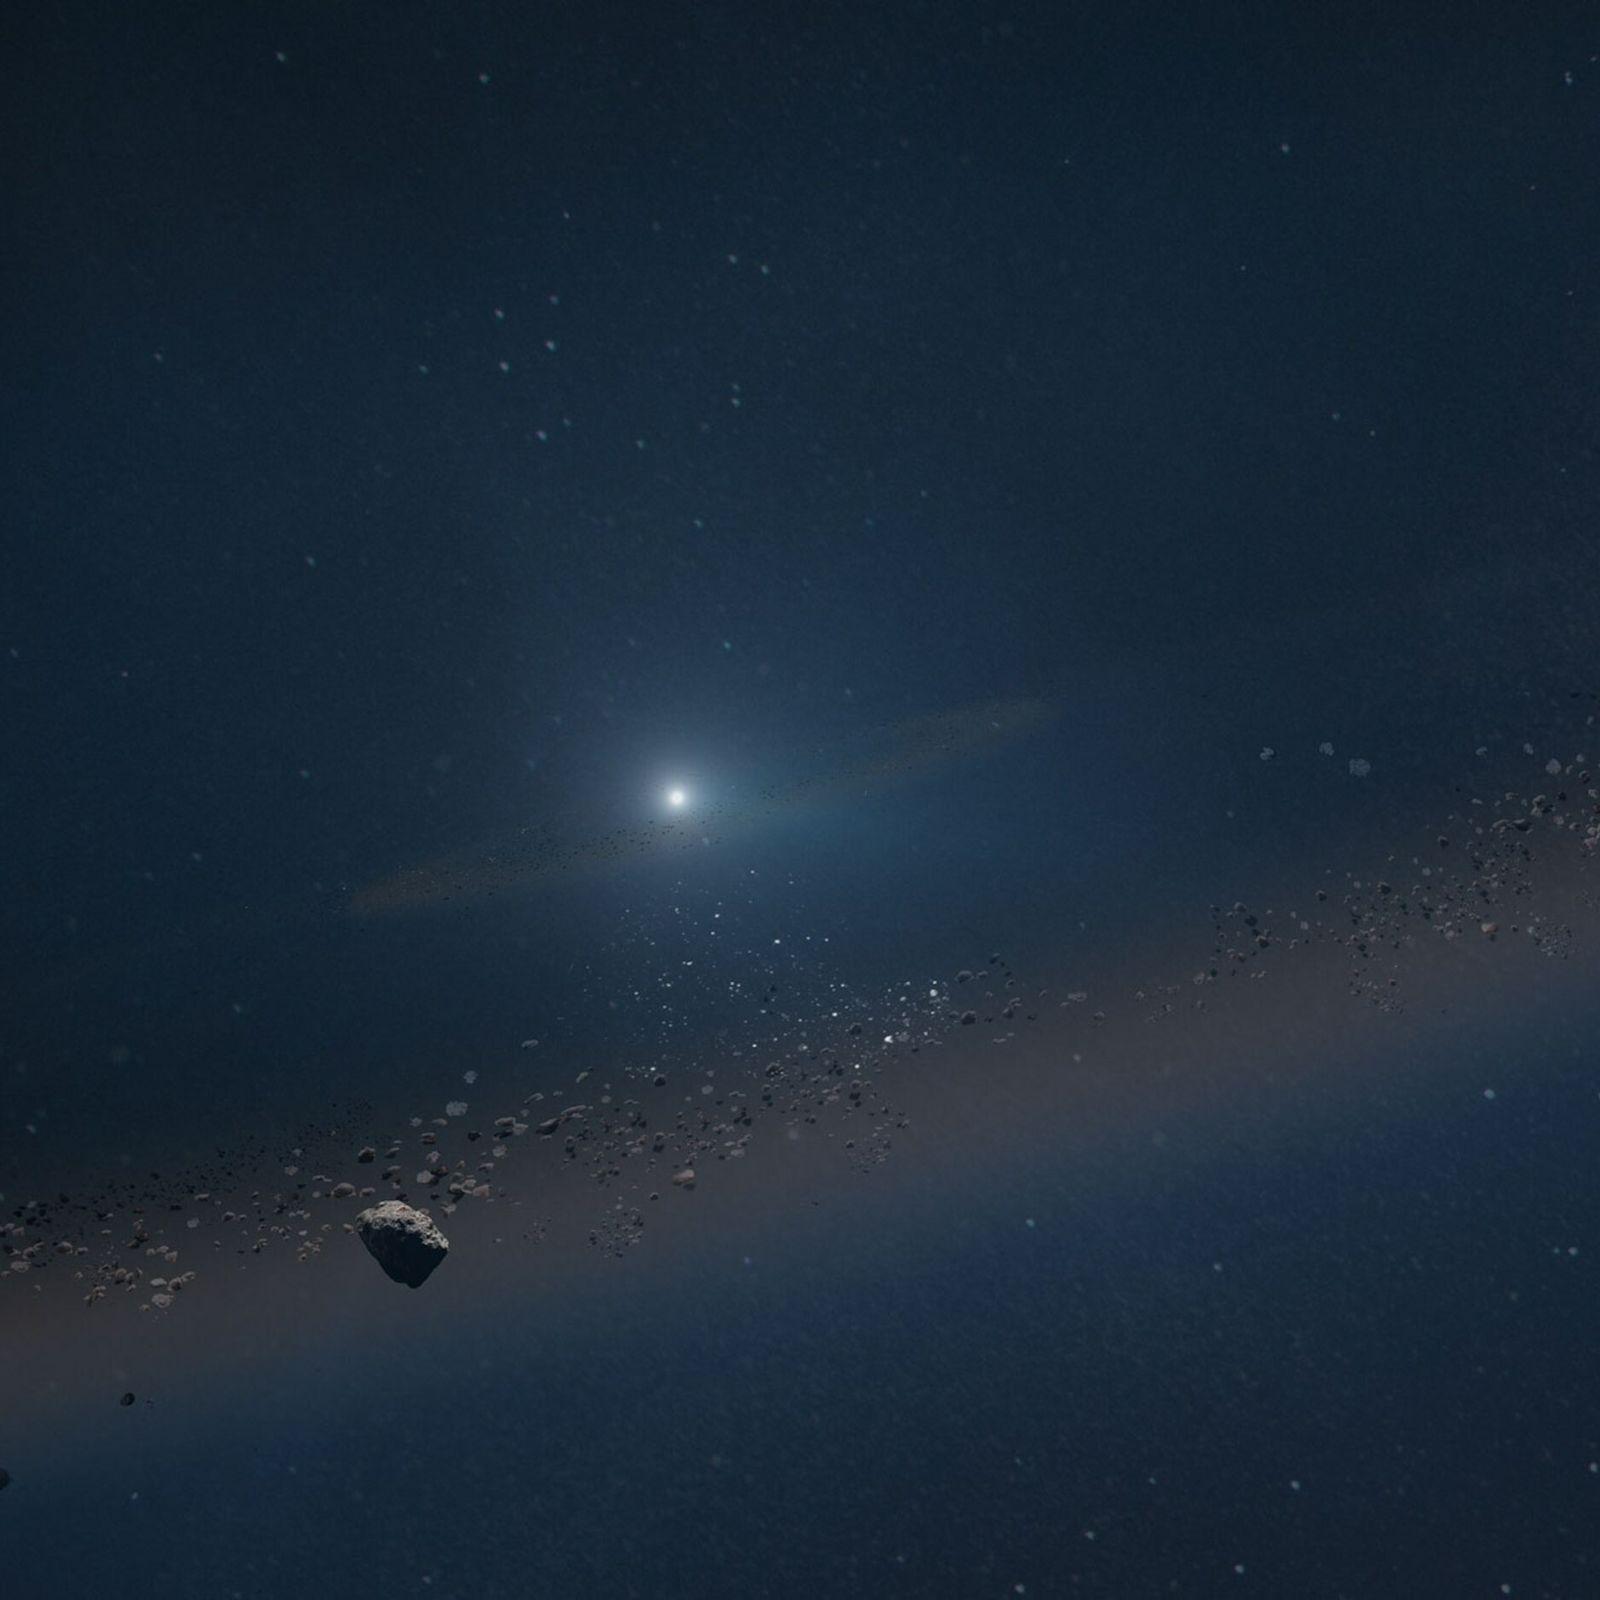 Planeta gigante gasoso